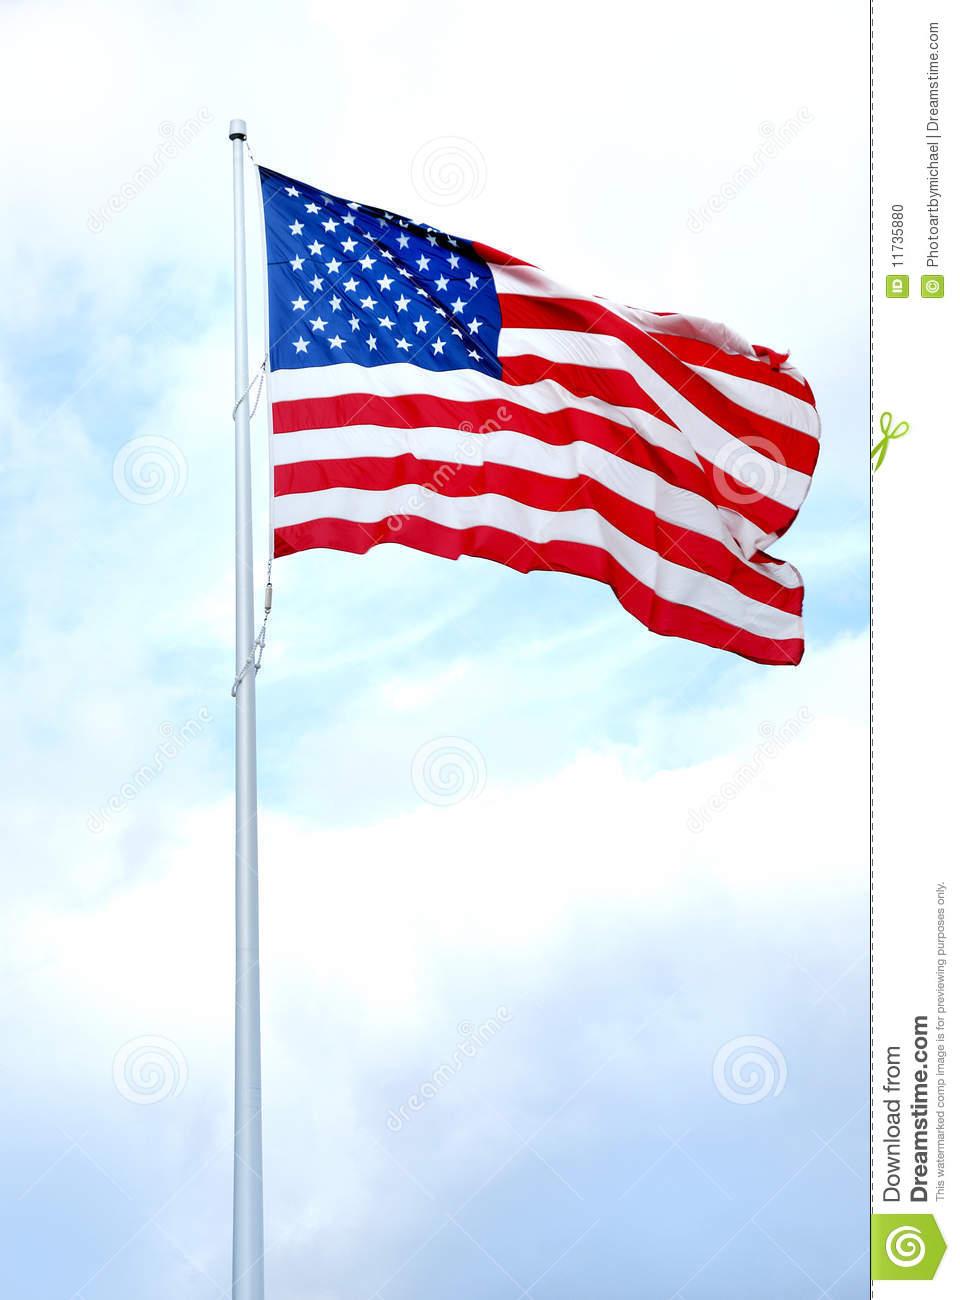 Us flag pole clipart clipart freeuse stock American Flag Pole Clipart - Clipart Kid clipart freeuse stock